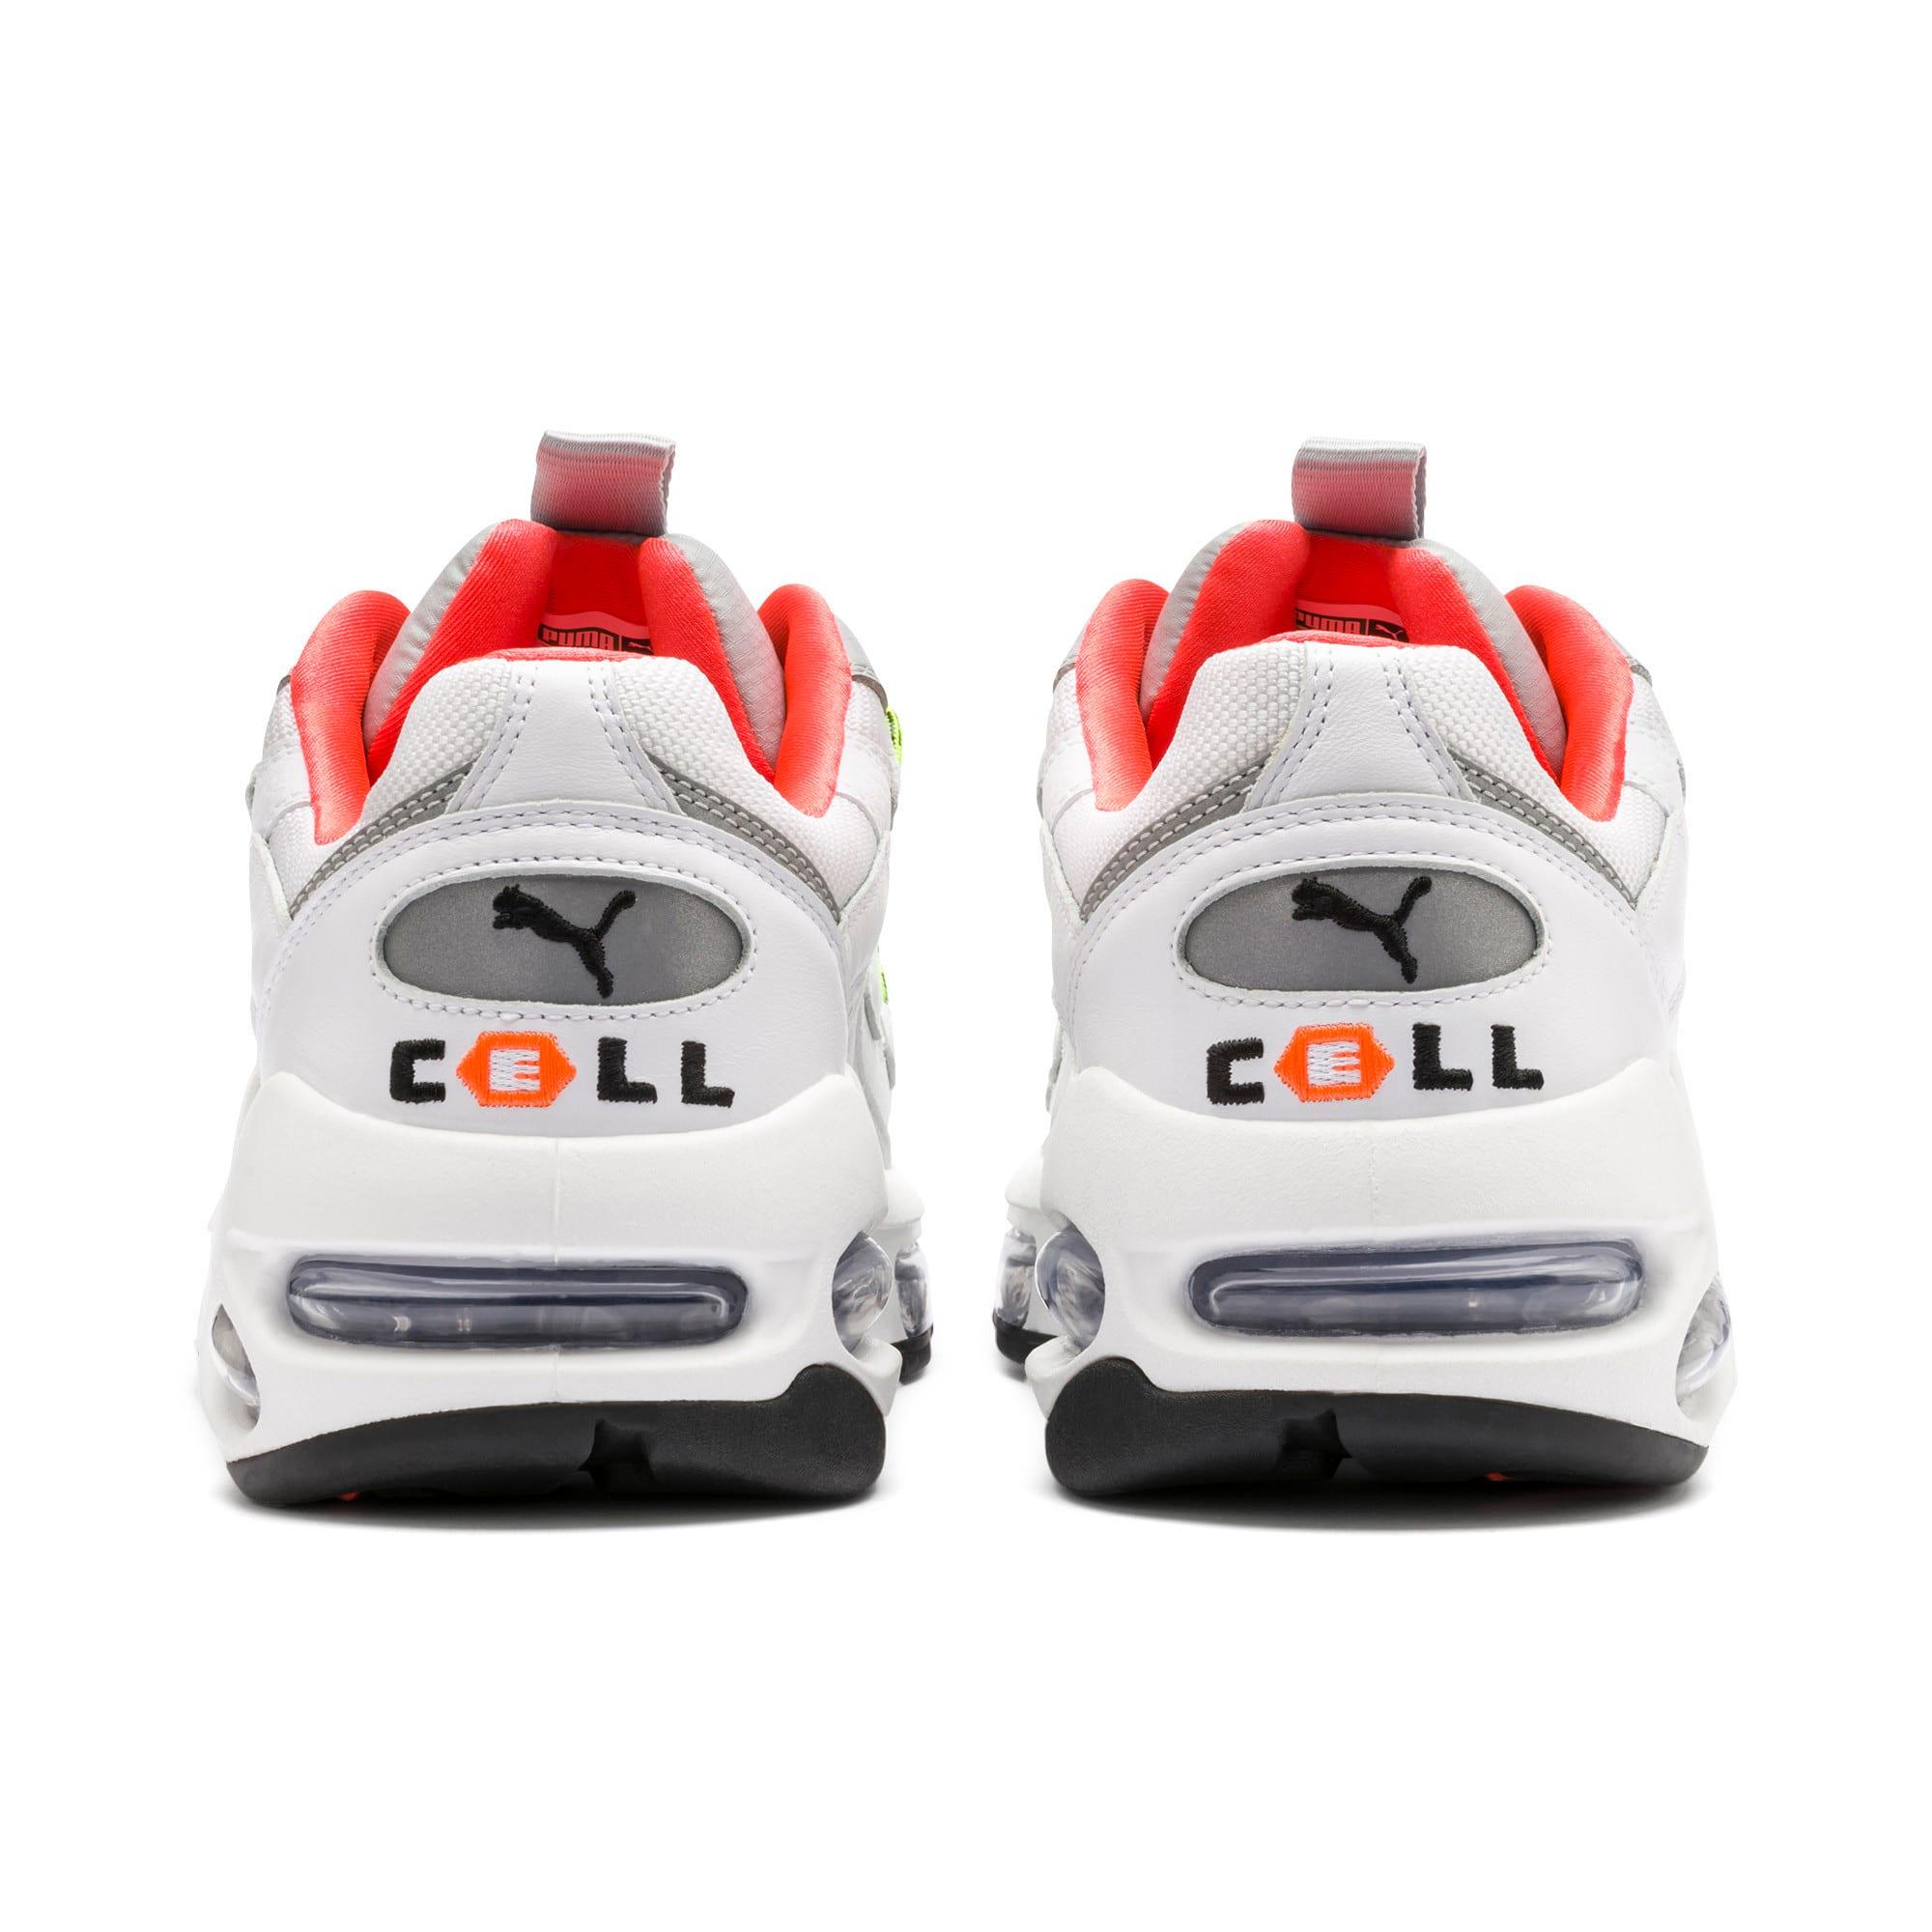 Thumbnail 4 of CELL Endura Rebound Sneakers, Puma White-High Rise, medium